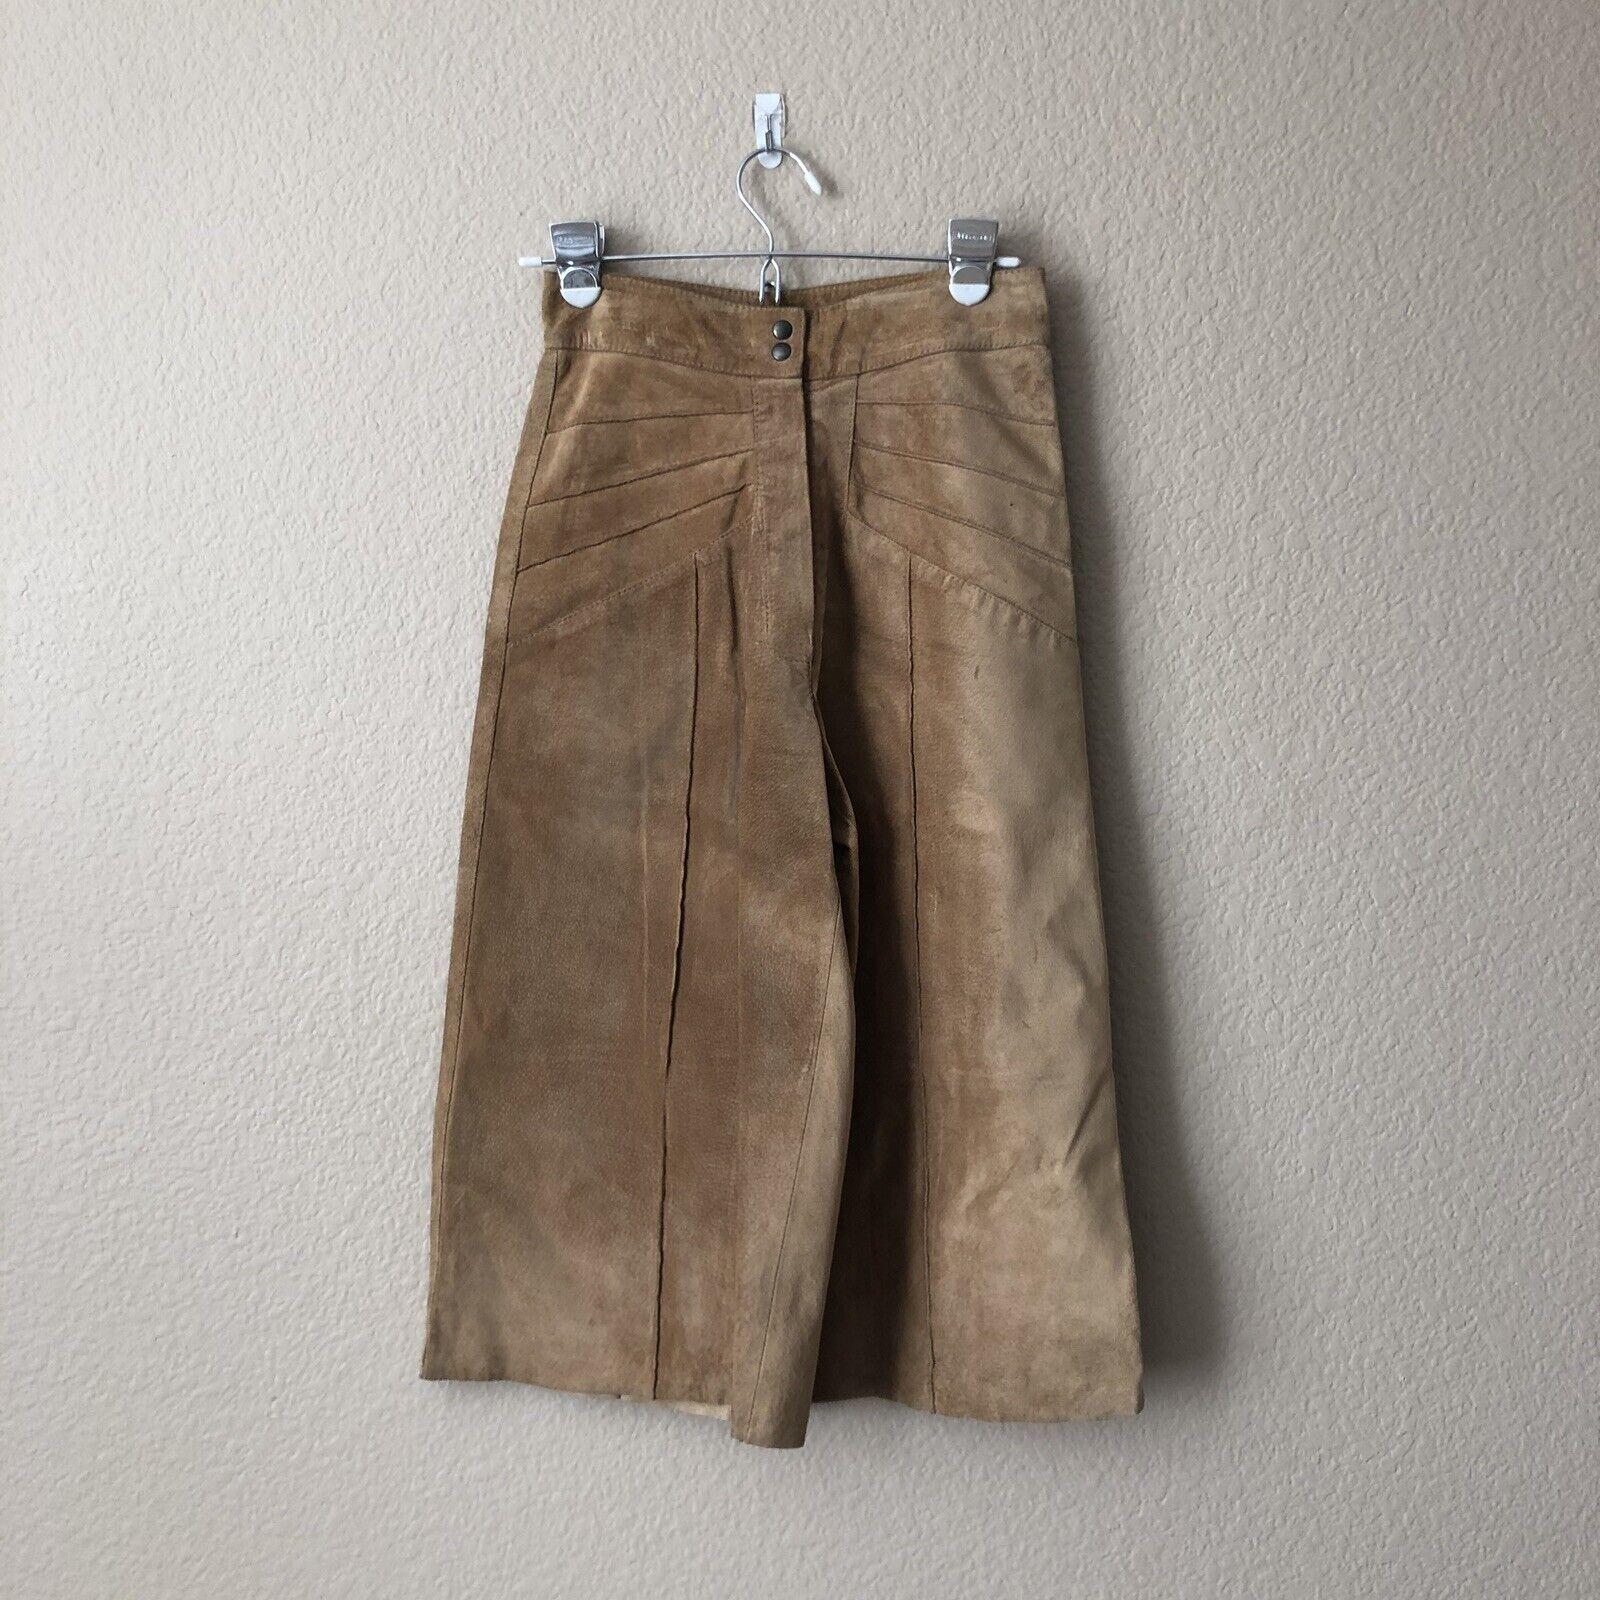 Alexander Mcqueen damen  Cropped Leather Pant Größe 42